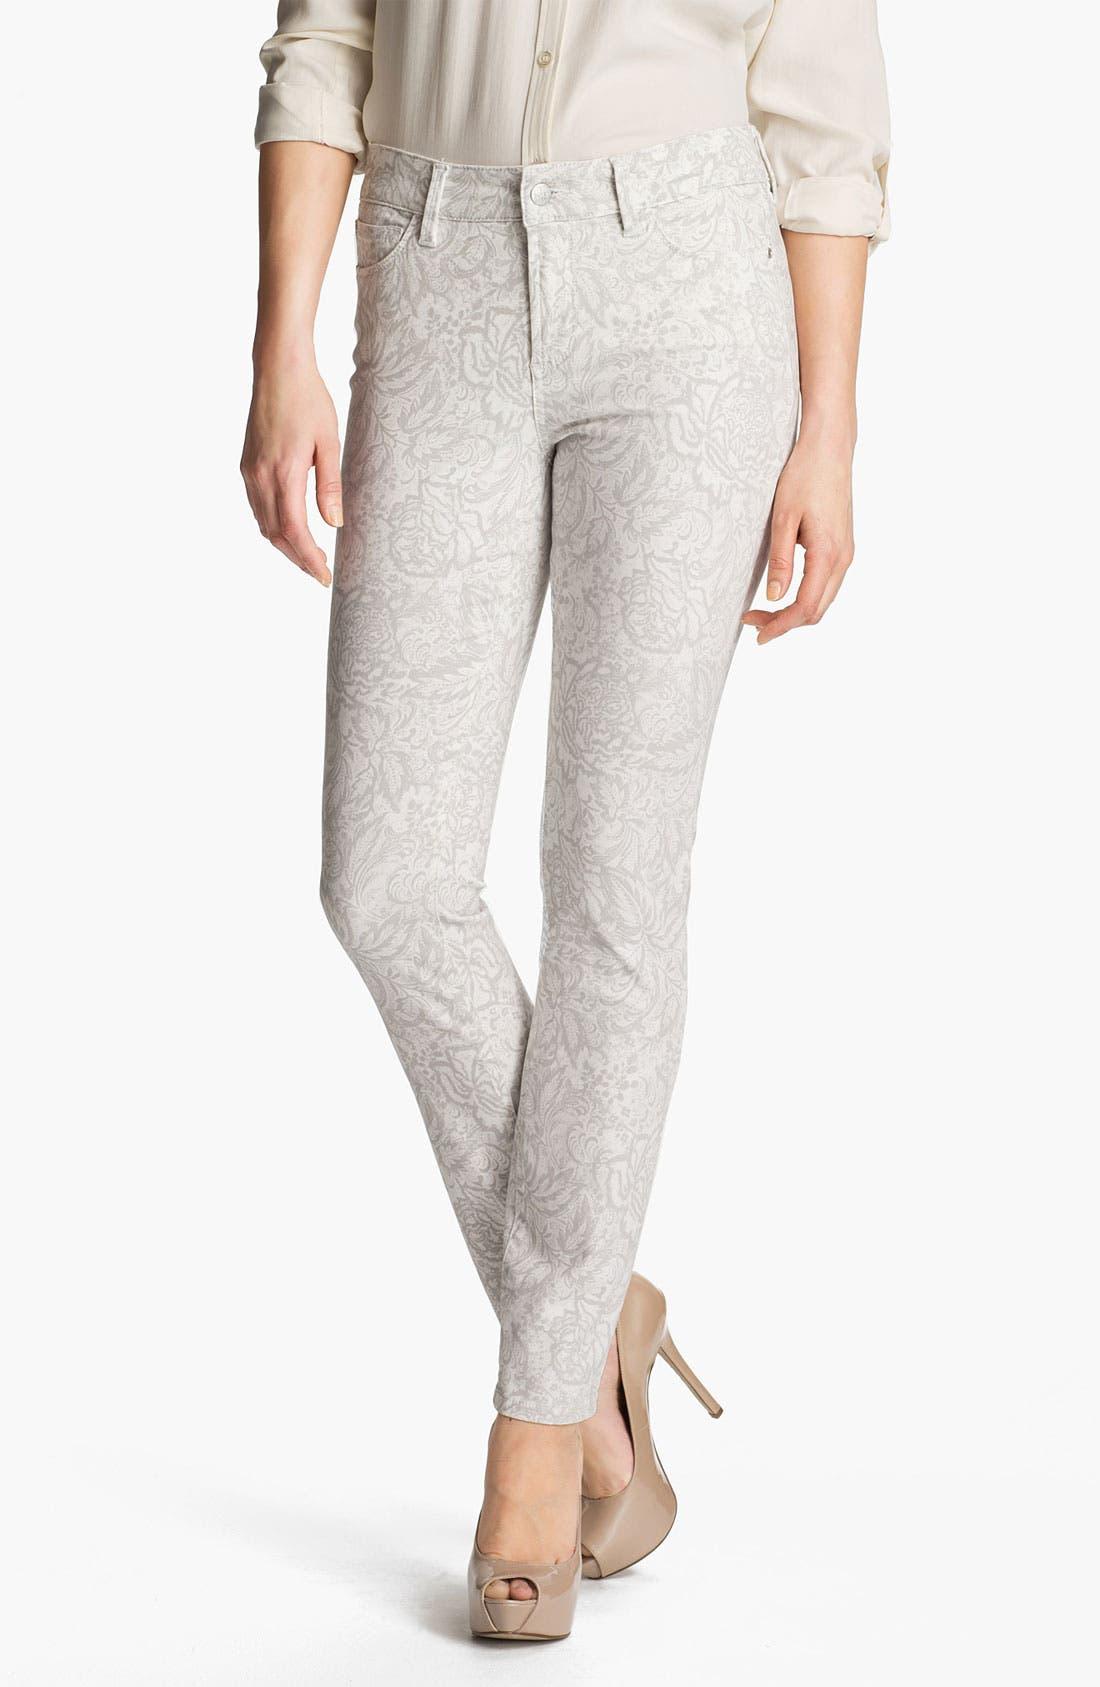 Alternate Image 1 Selected - NYDJ 'Alisha' Print Skinny Stretch Ankle Jeans